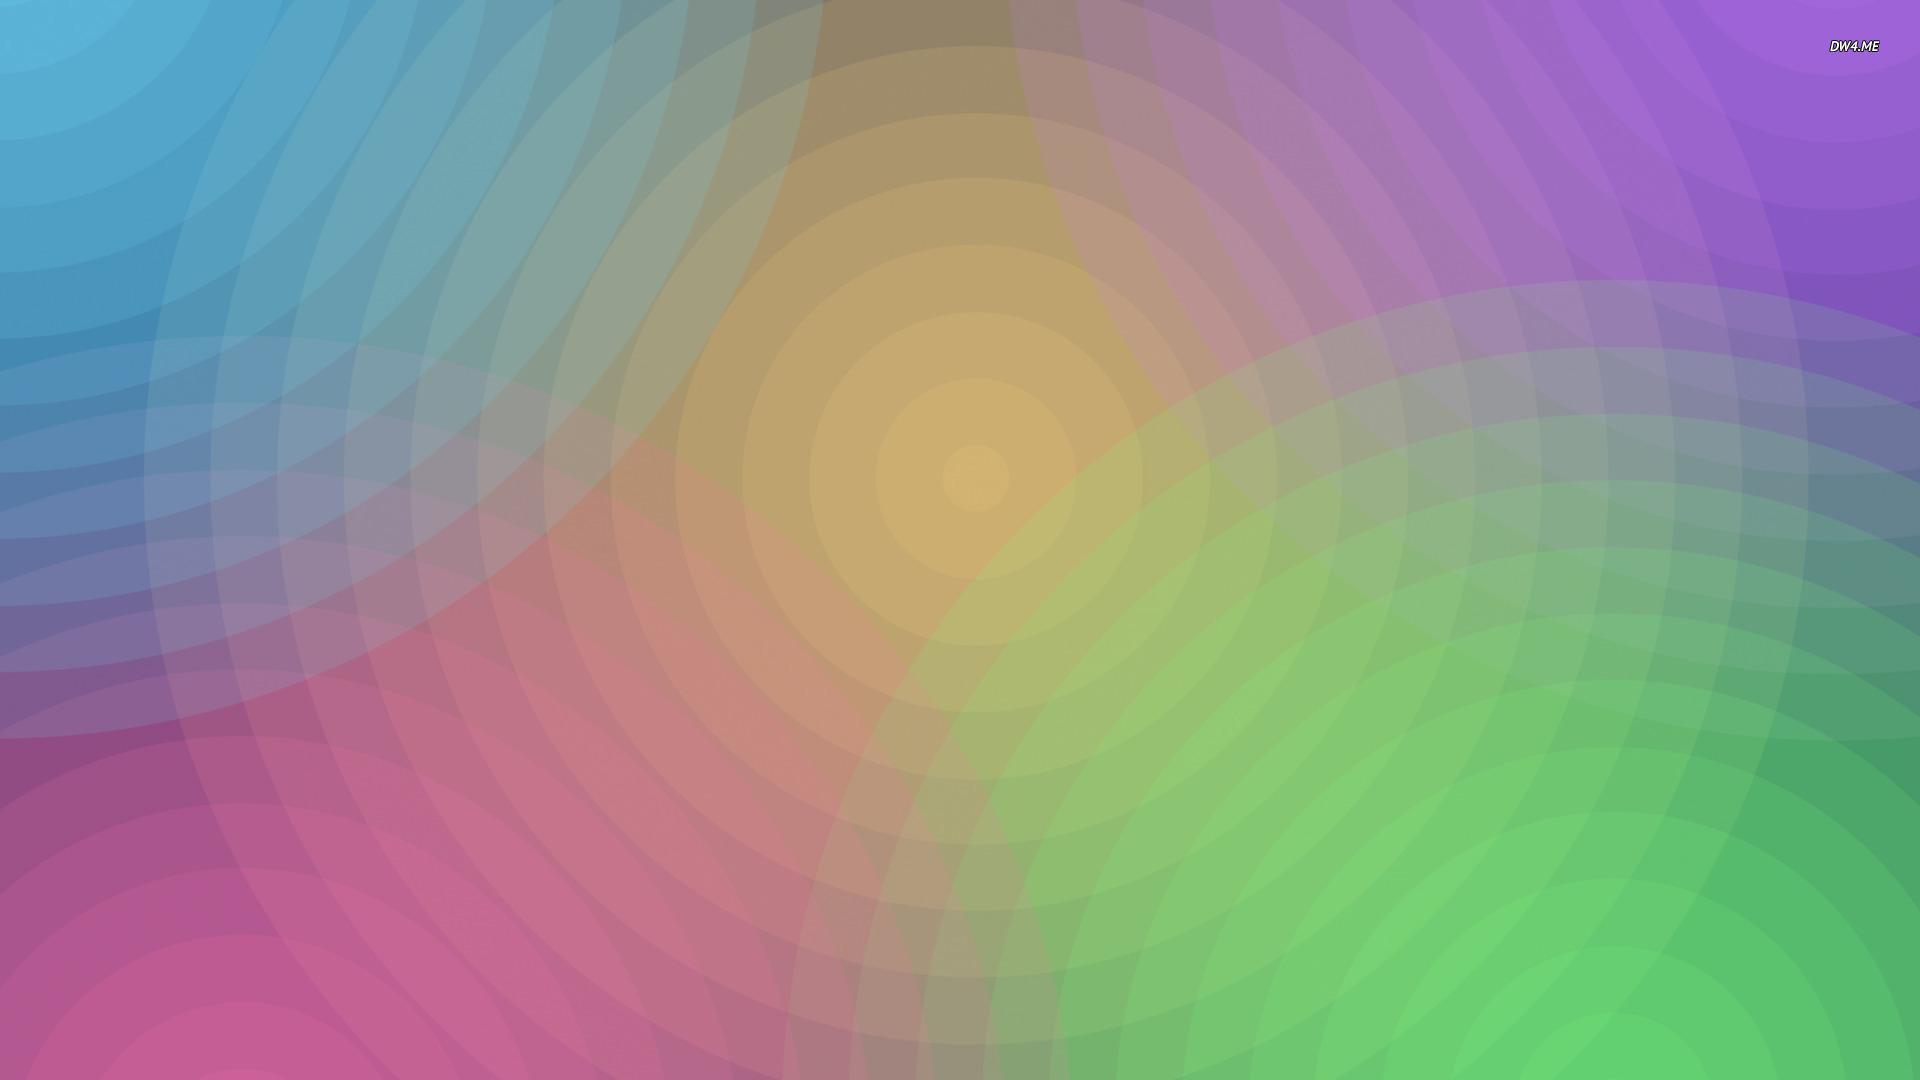 Pastel colored bows wallpaper Wallpaper Wide HD 1920x1080